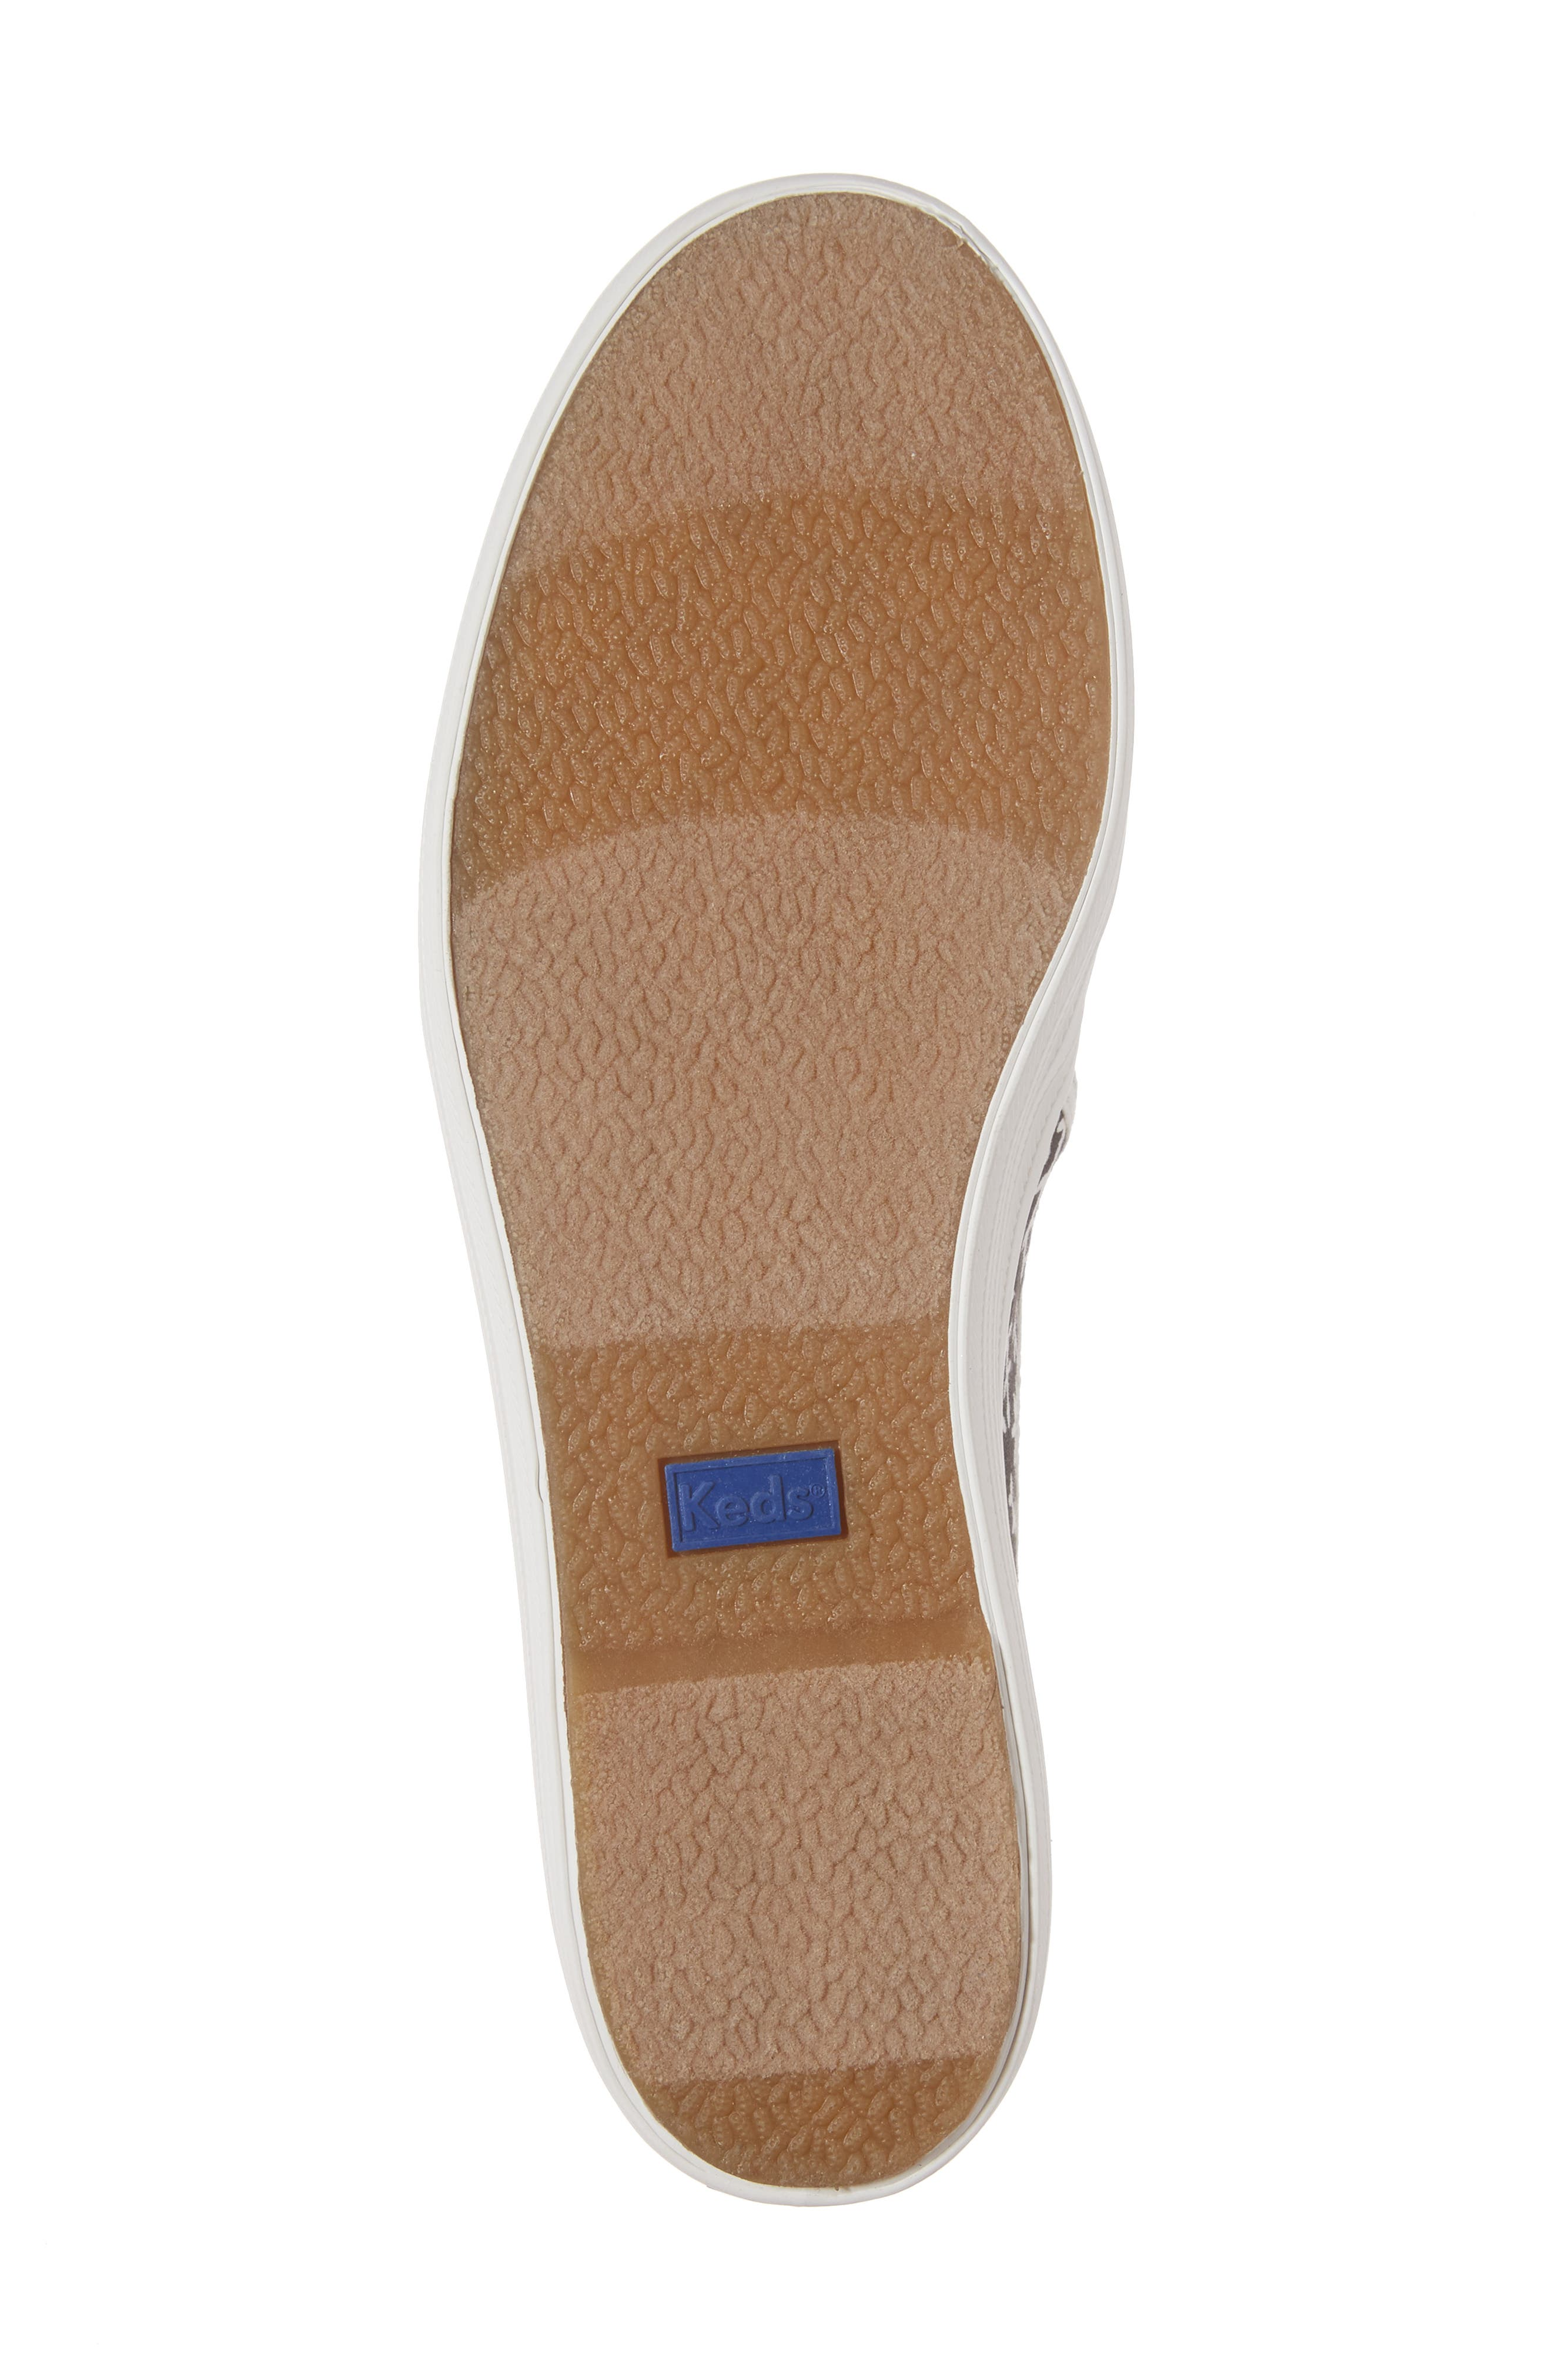 Keds<sup>®</sup> x kate spade Triple Decker Slip-On Sneaker,                             Alternate thumbnail 11, color,